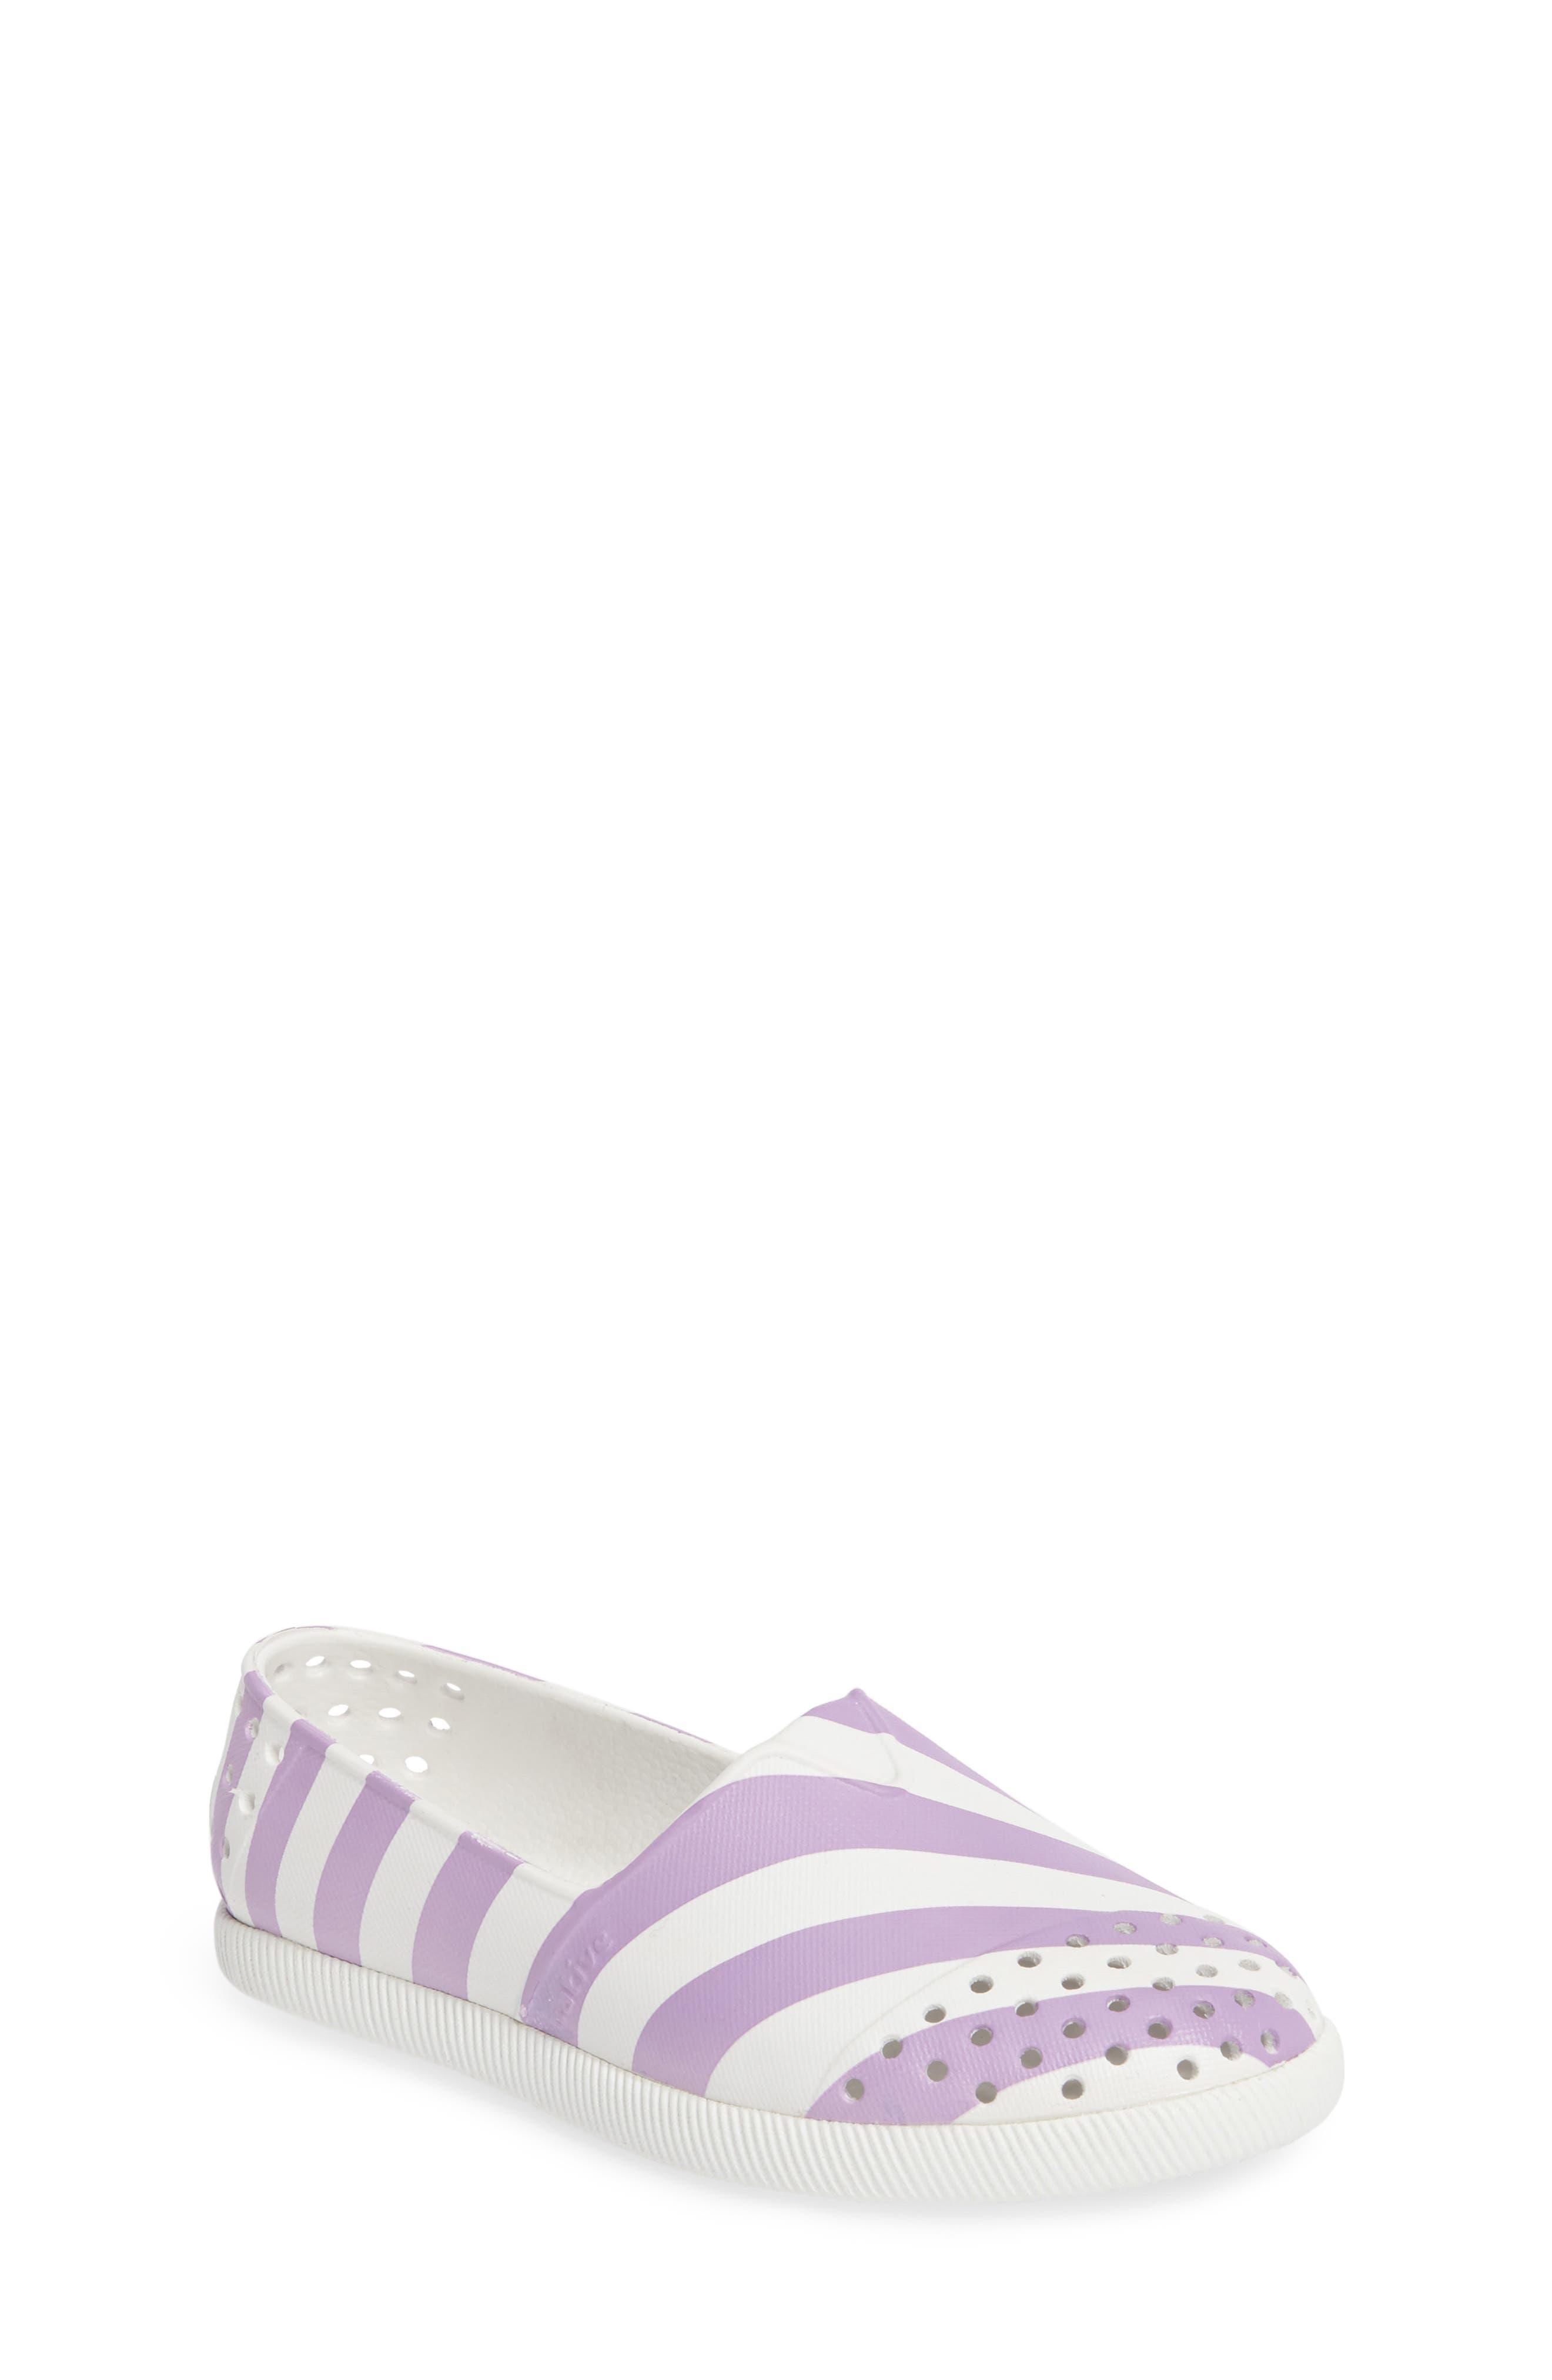 Native Shoes Verona Slip-On Sneaker (Baby, Walker, Toddler & Little Kid)